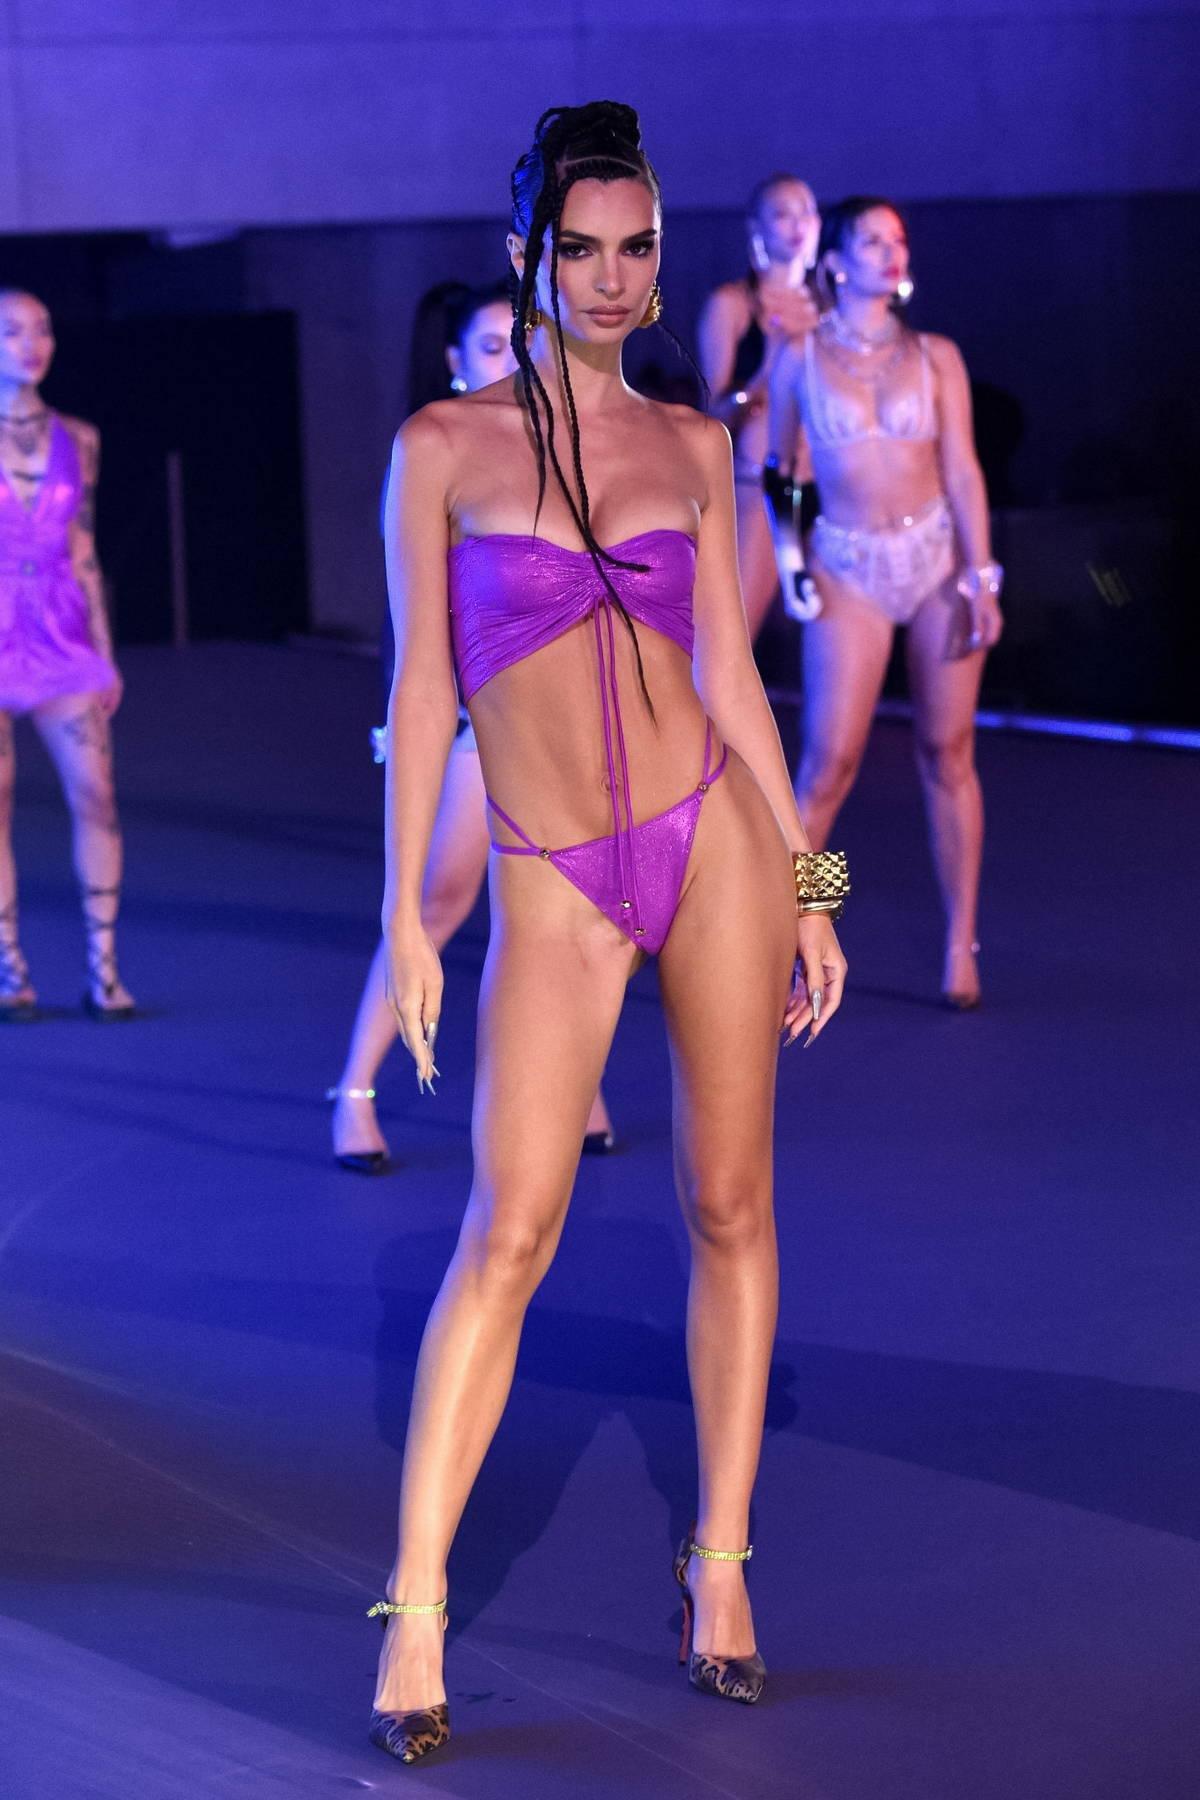 Emily Ratajkowski walks the runway for Fenty X Savage Fashion Show Vol 3 in Los Angeles